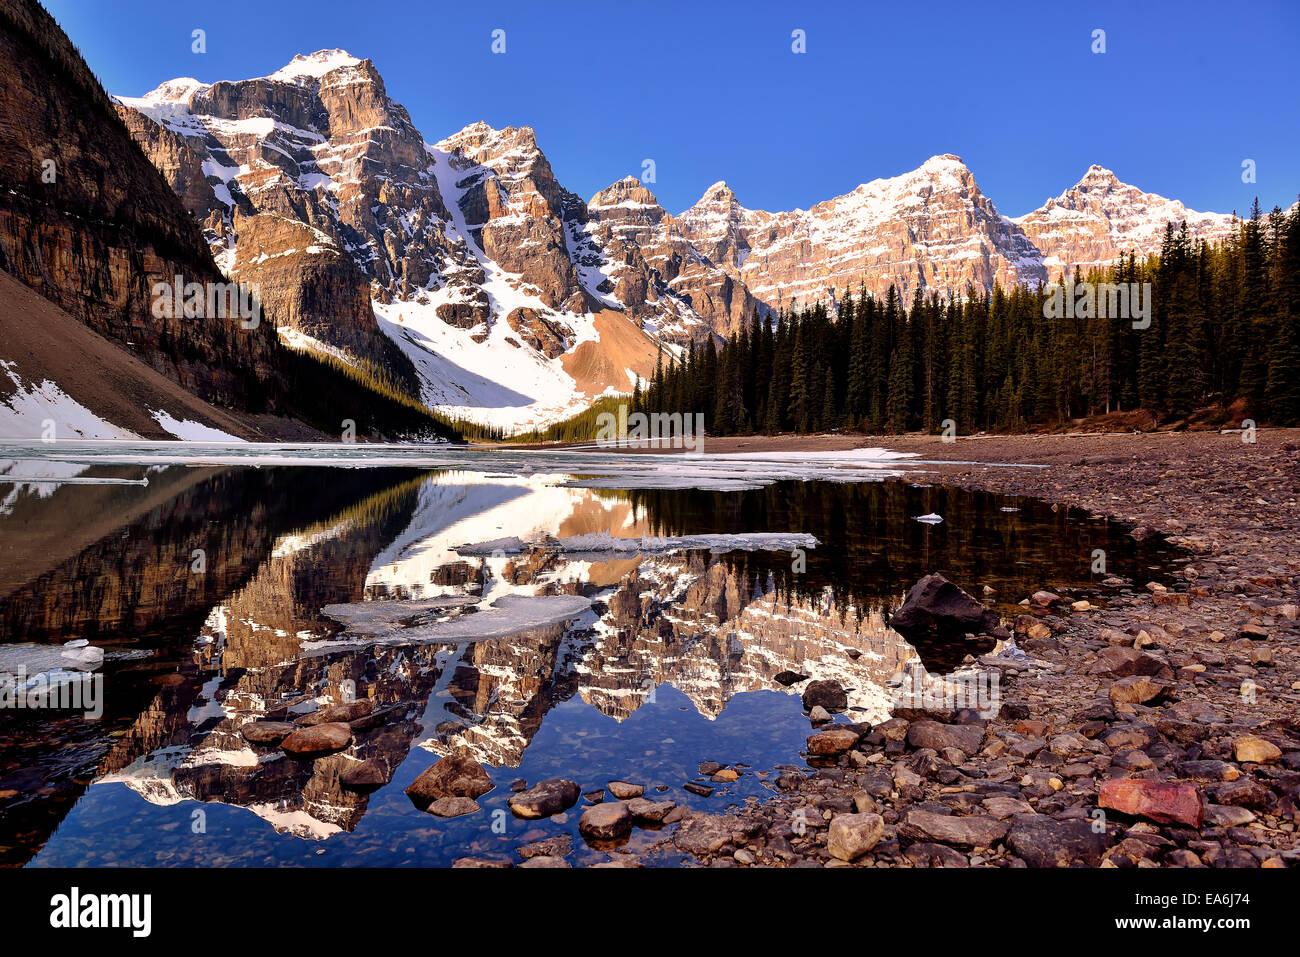 Kanada, Banff National Park, Blick auf Moraine Lake und Valley of the Ten Peaks Stockfoto